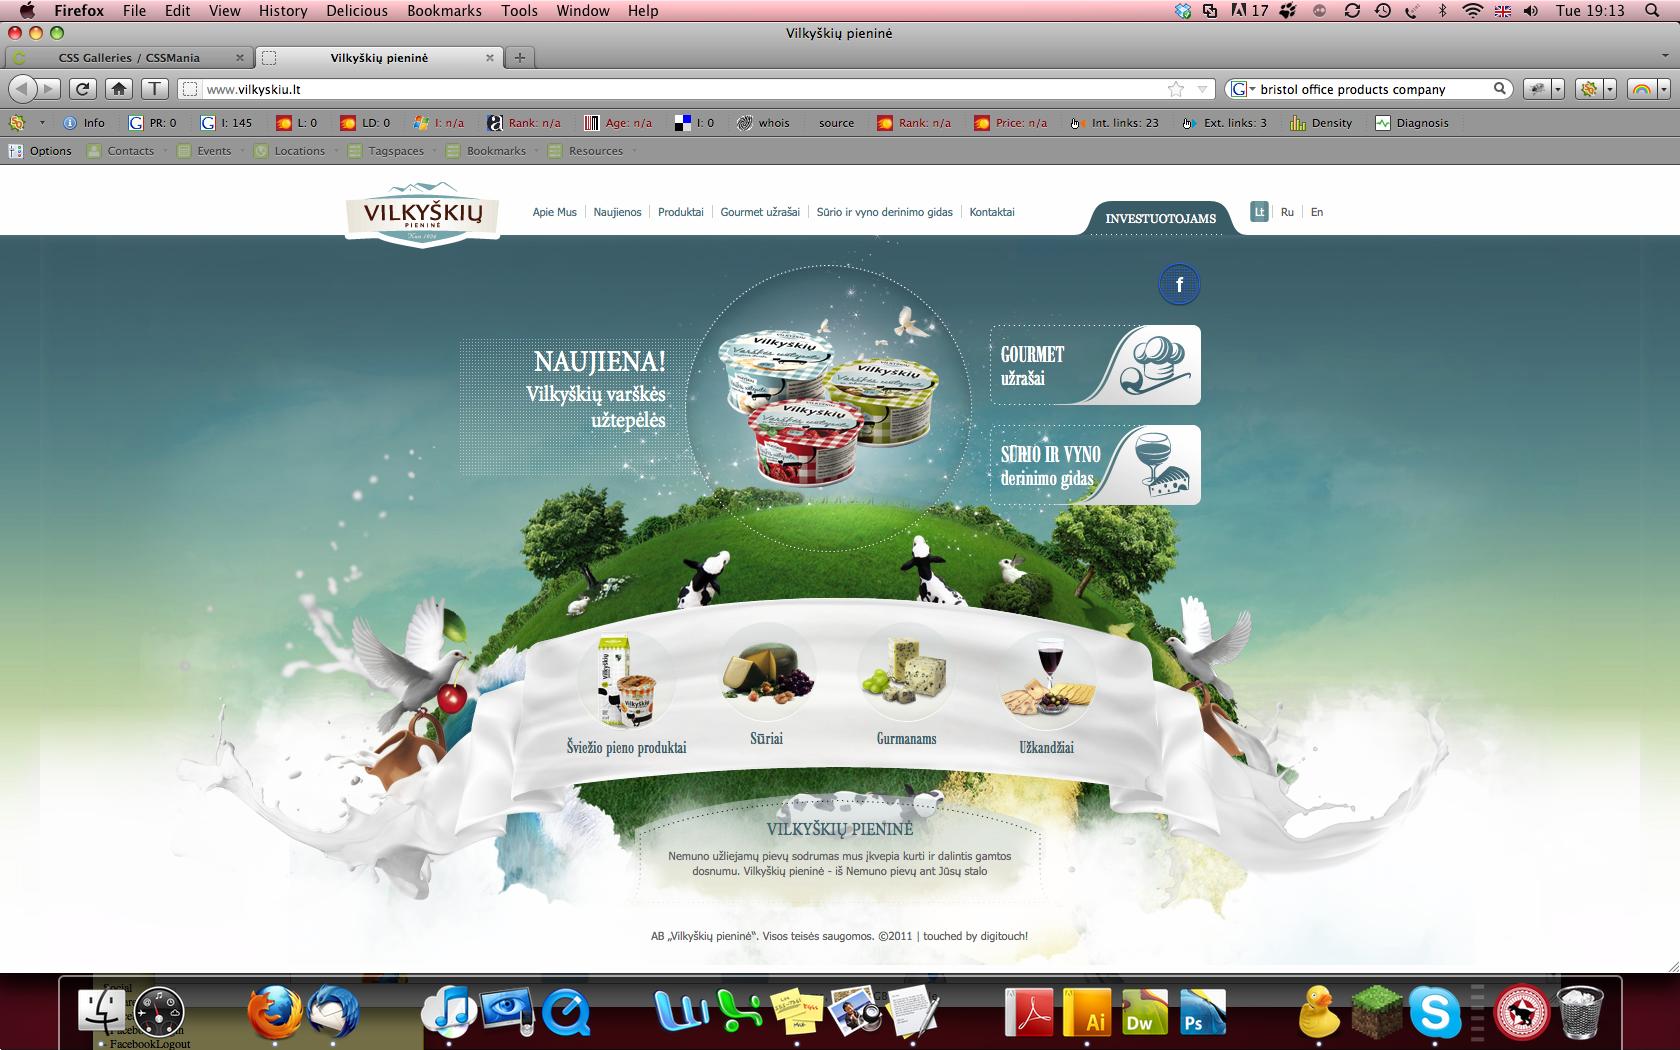 Website Inspiration - January 2012